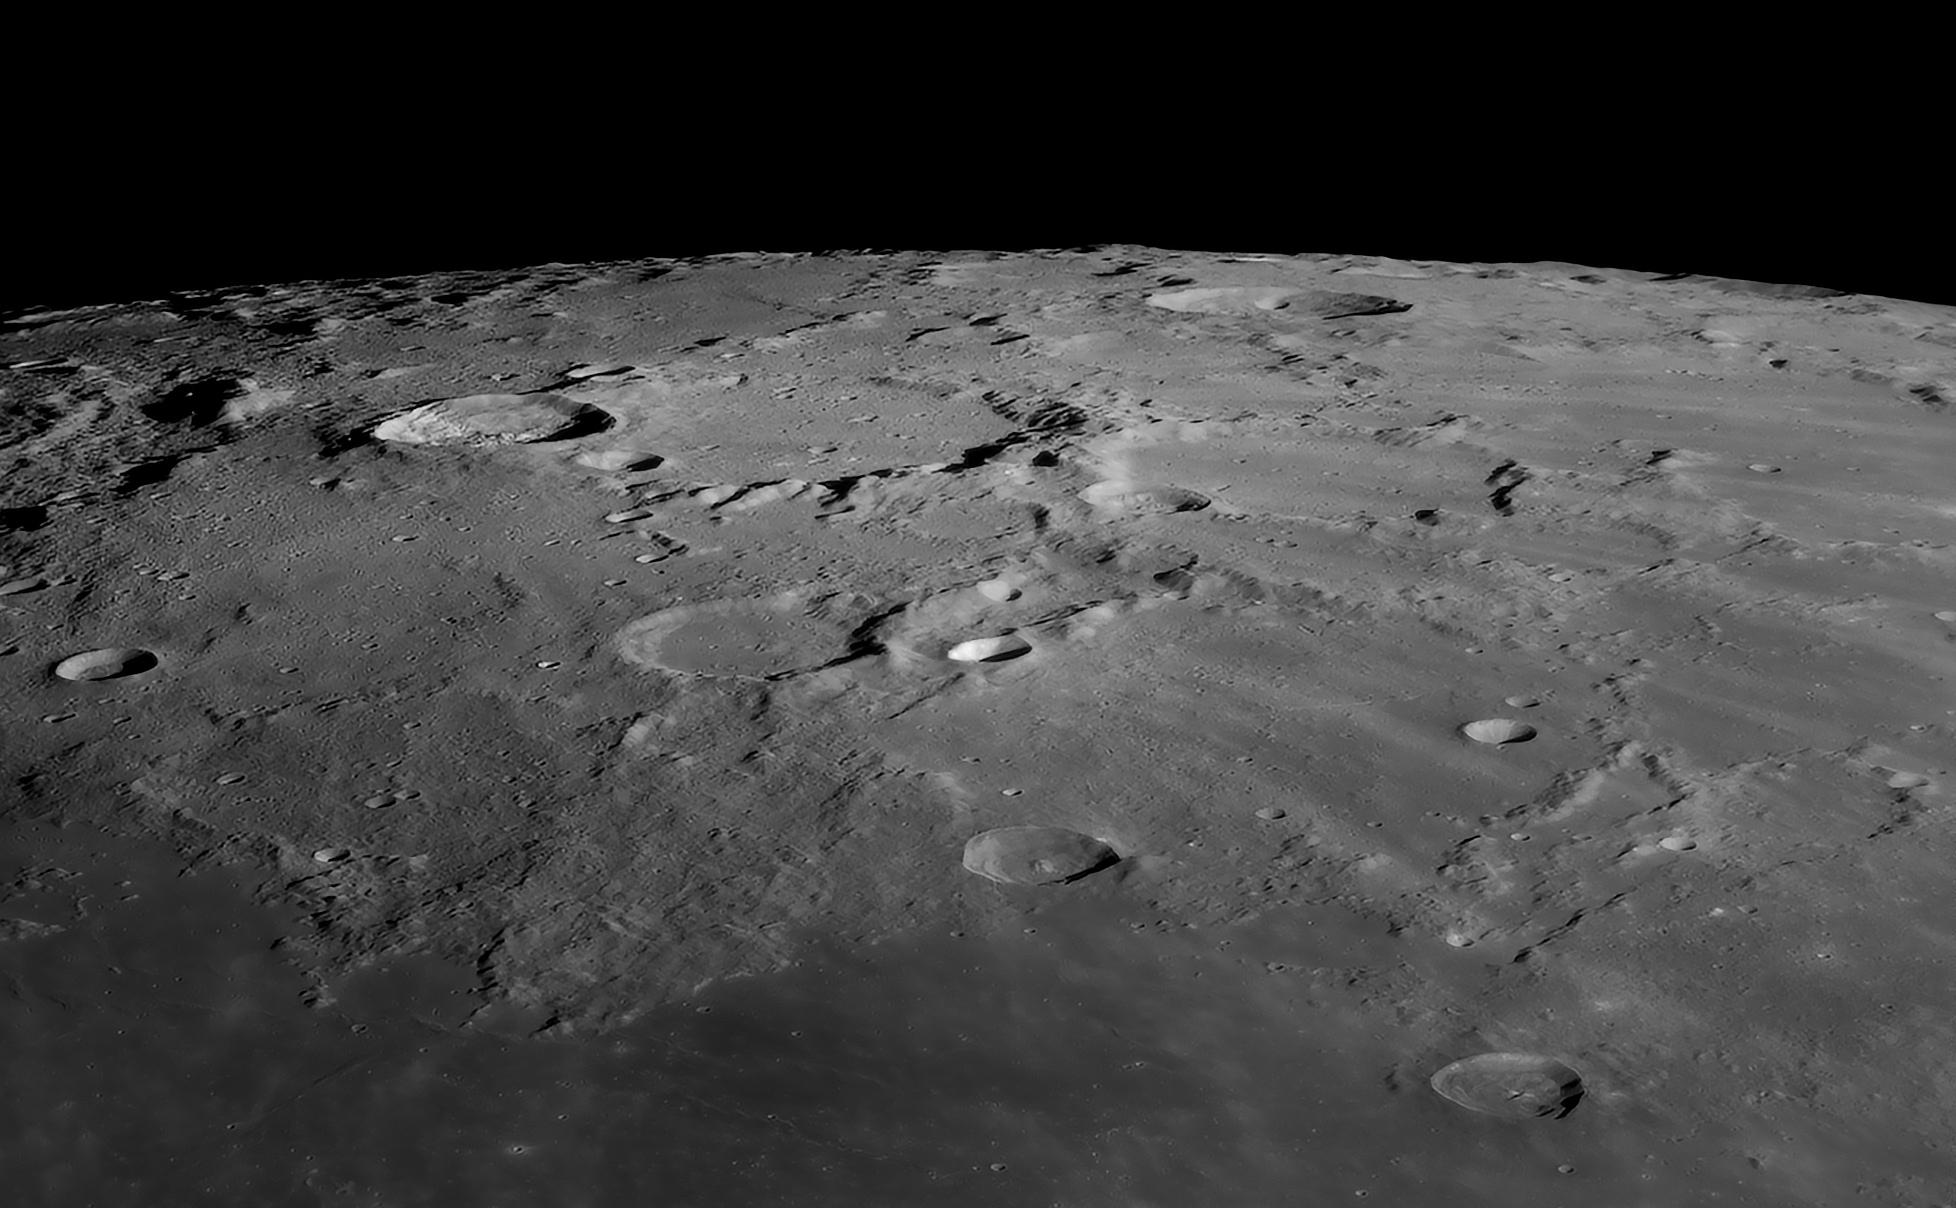 Anaxagoras au C14, le 4 Avril 2020: 300 images, caméra 174MM, Baader FFC, ADC Pierro Astro, filtre Astronomik orange 2c